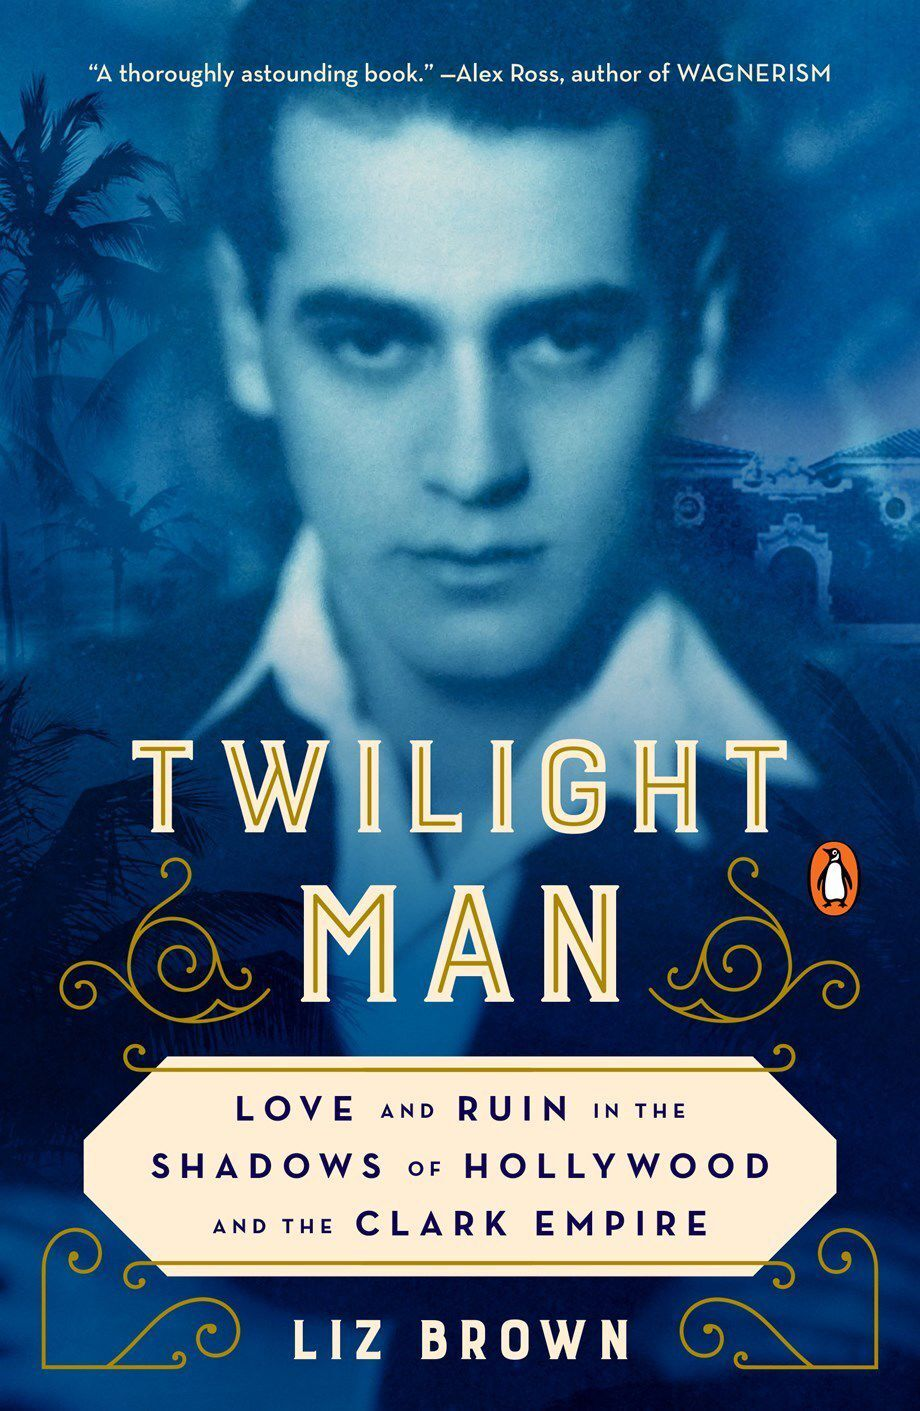 twilight man.jpg